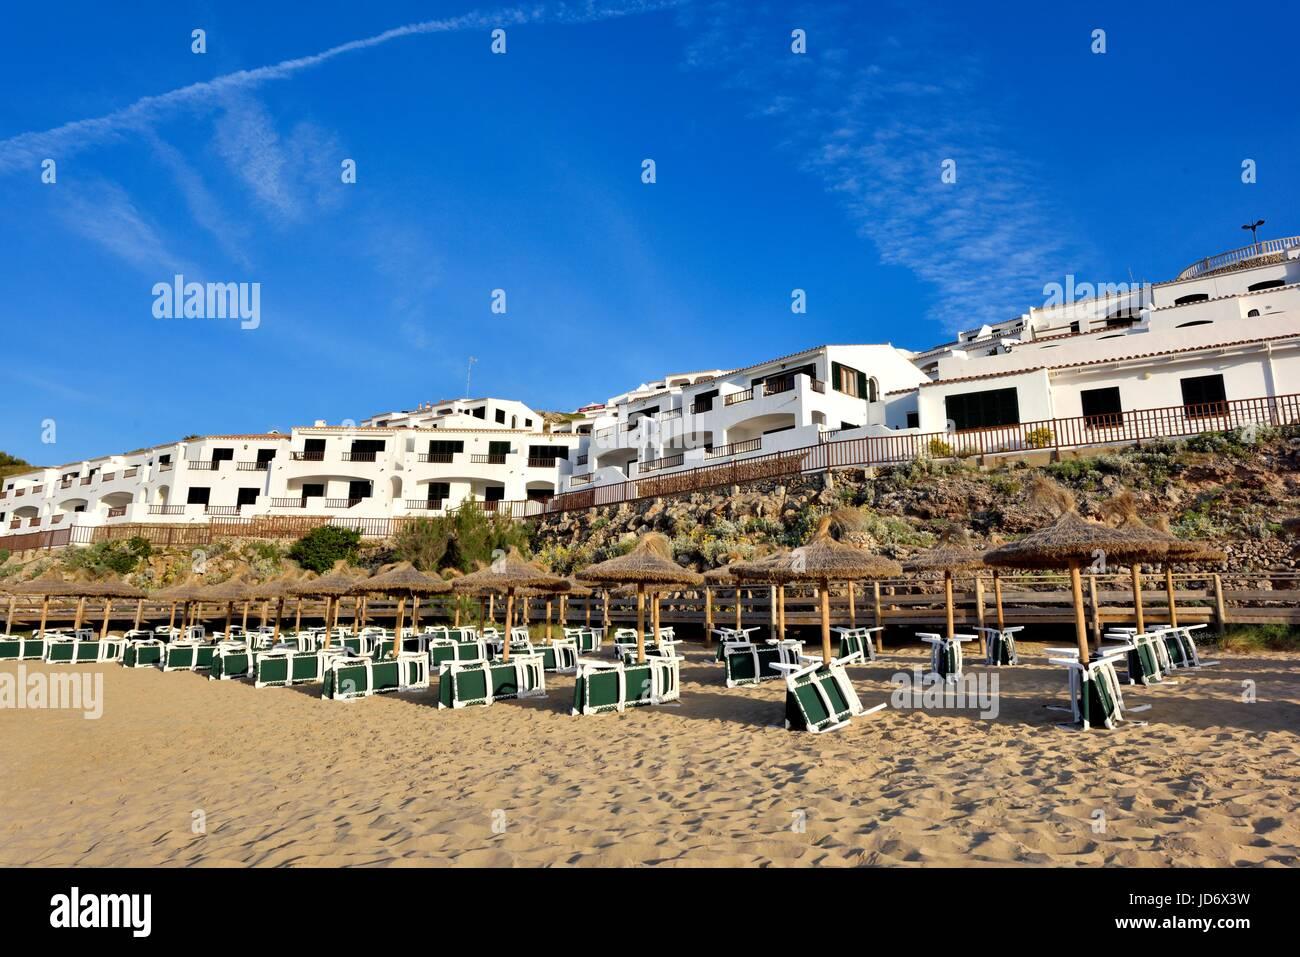 Sea view villas apartments - Stock Image